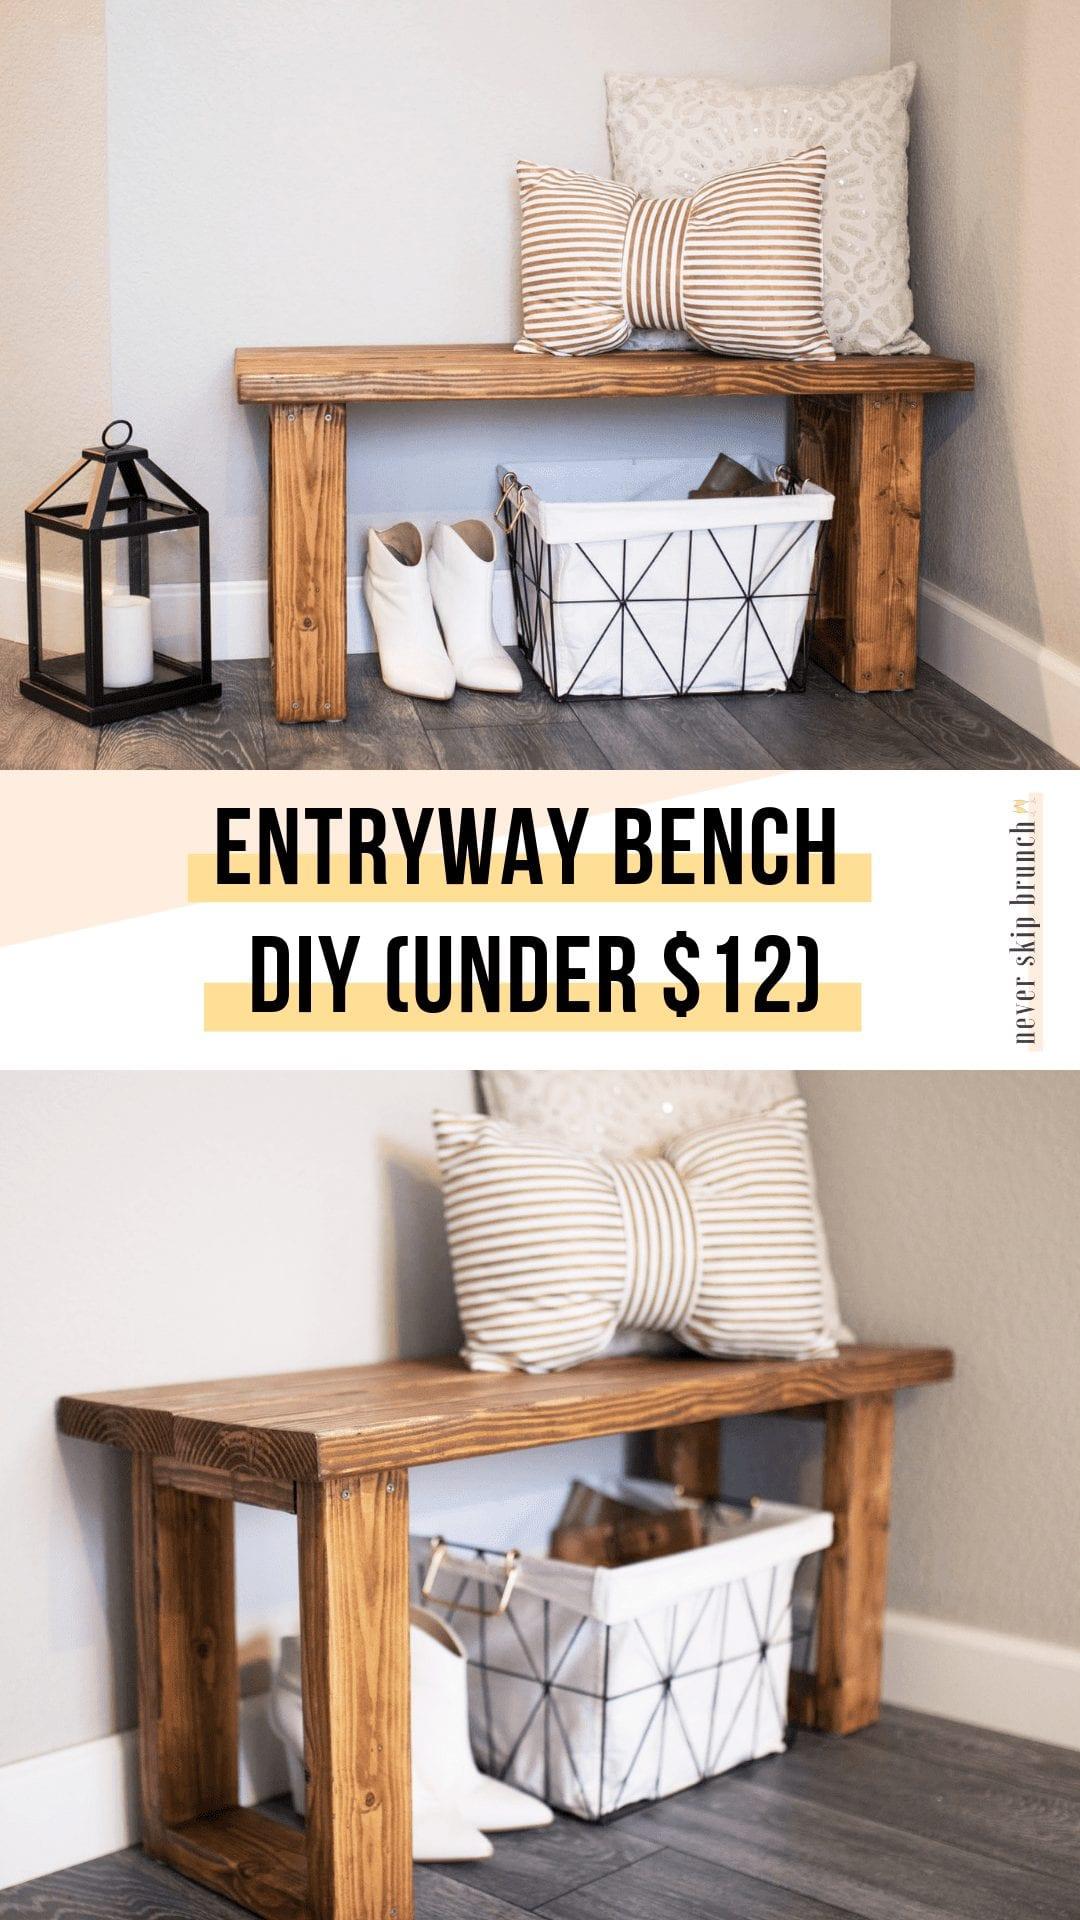 entryway bench diy small | entryway bench decor | entryway bench ideas | entryway ideas | entryway decor | DIY Bench DIY Furniture | never skip brunch by cara newhart #decor #DIY